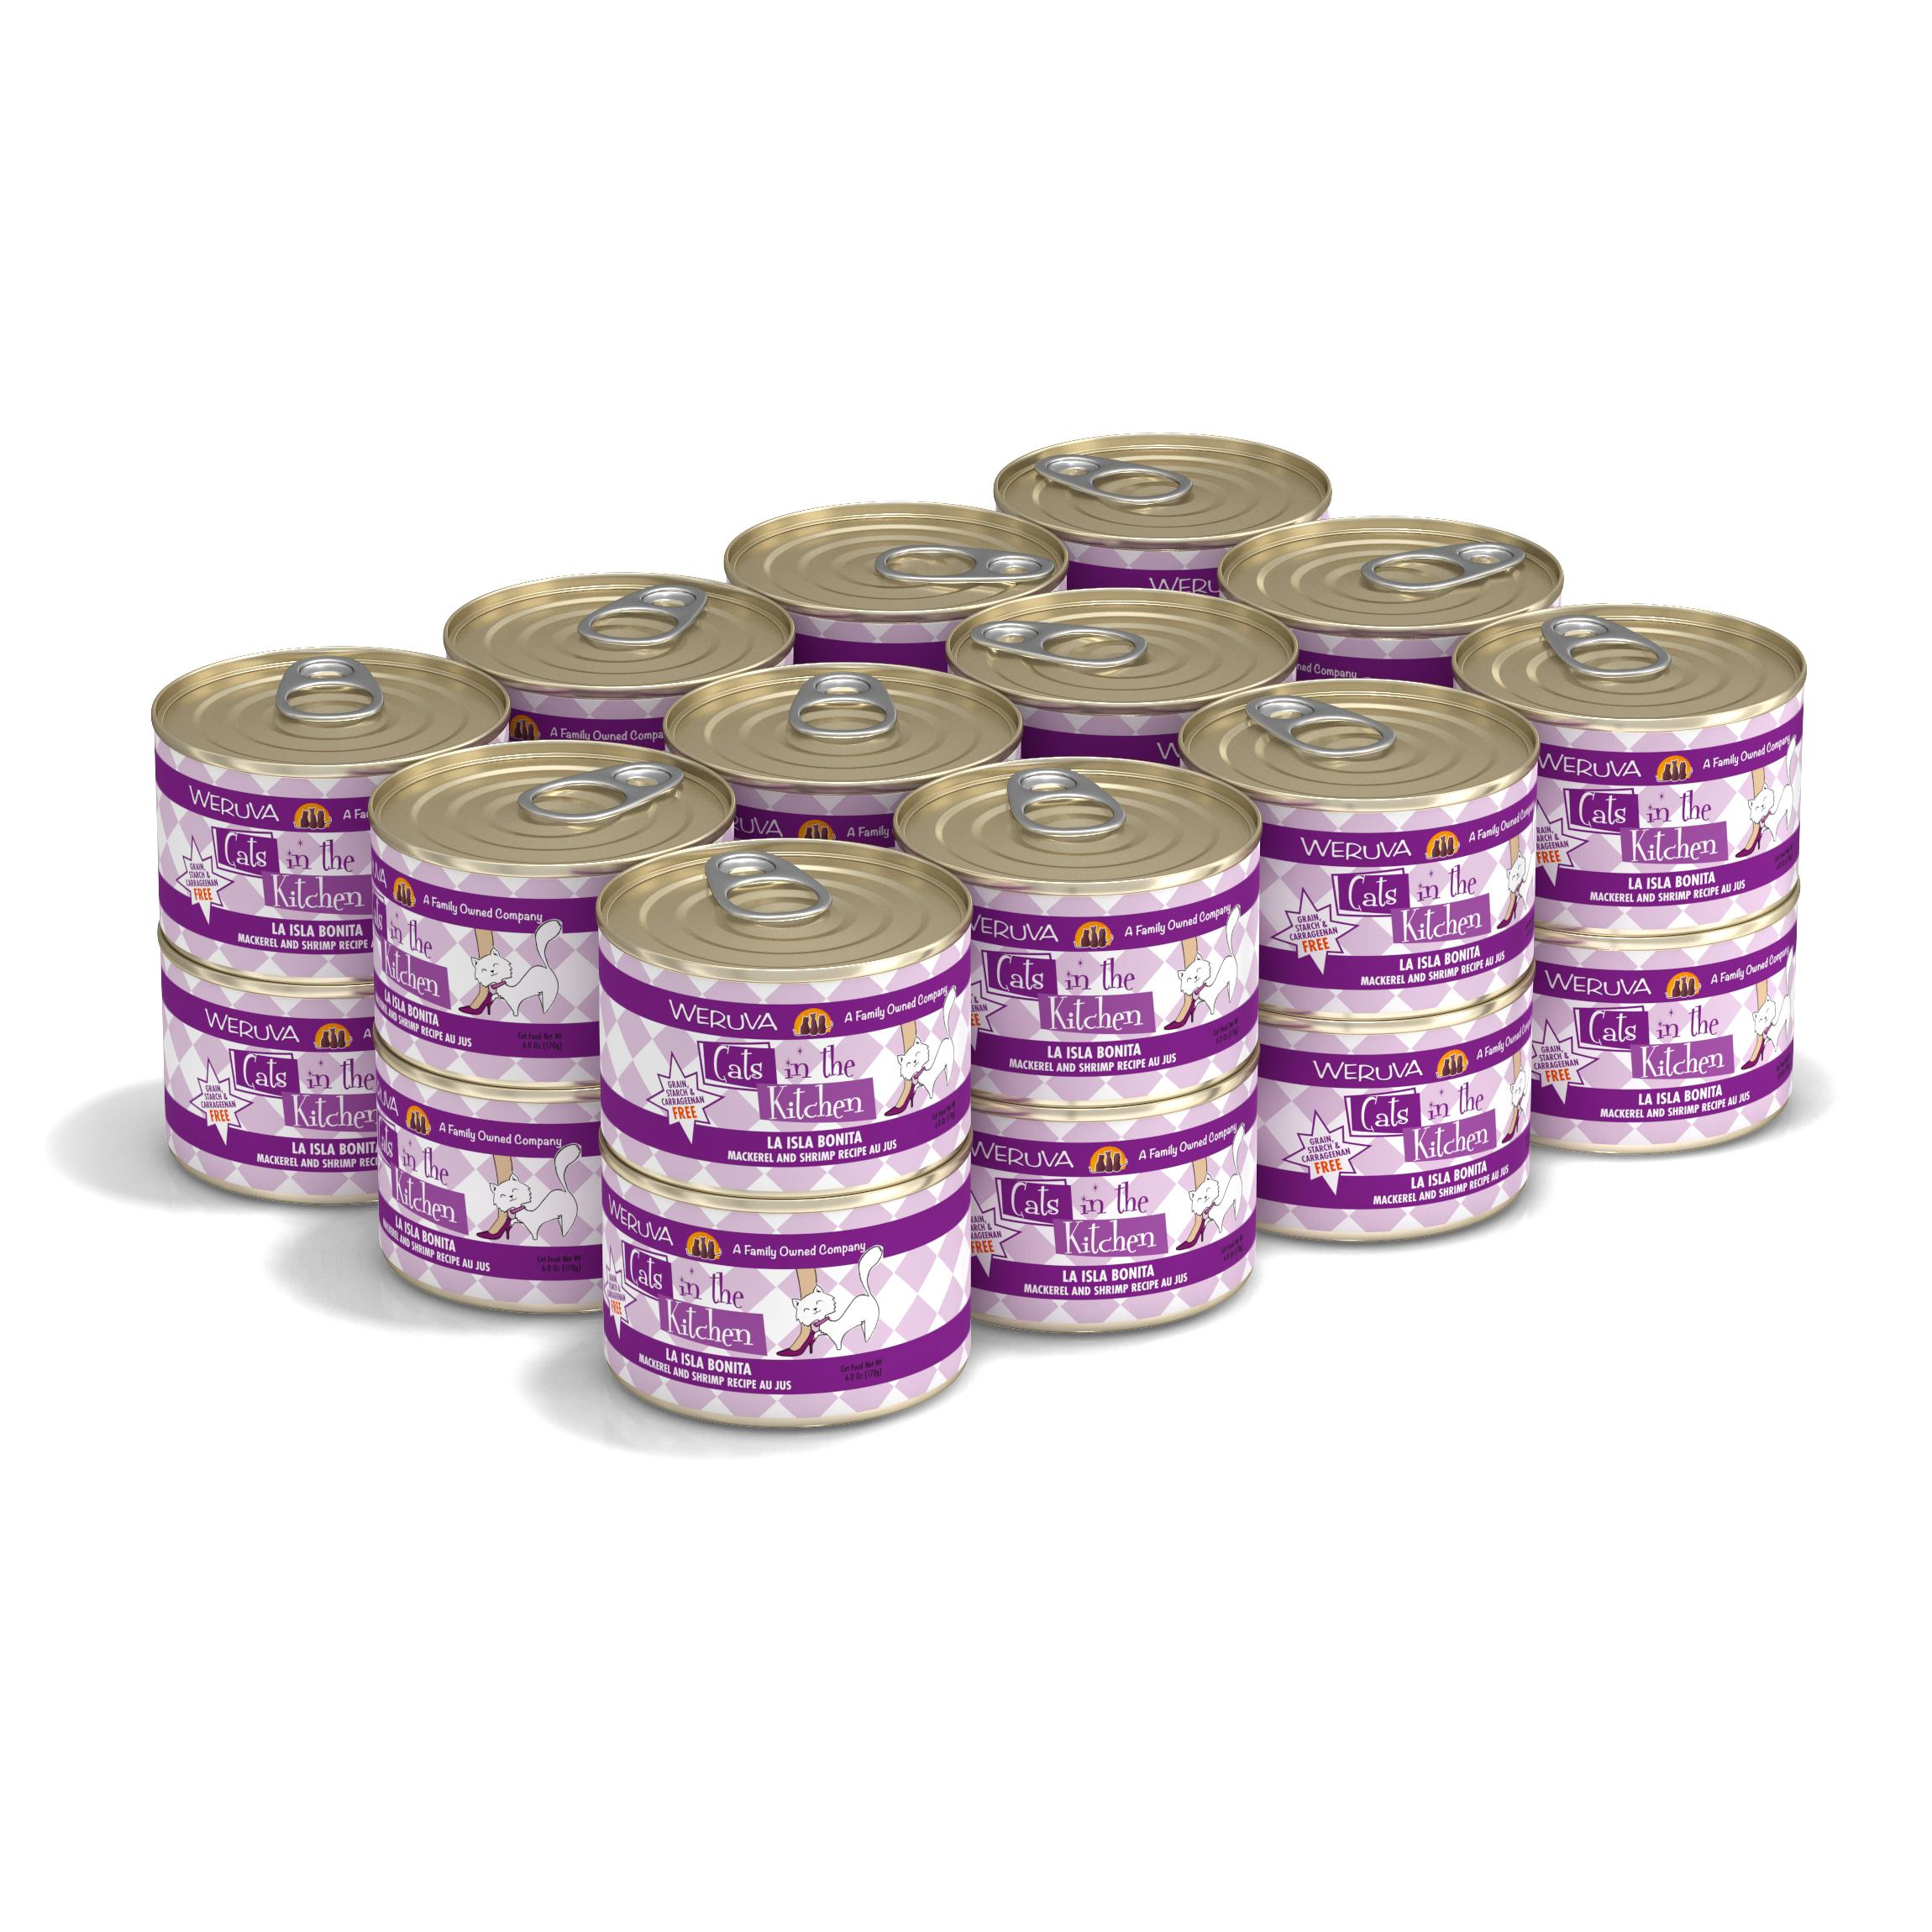 Weruva Cats in the Kitchen La Isla Bonita Mackerel & Shrimp Au Jus Grain-Free Wet Cat Food, 6-oz, case of 24